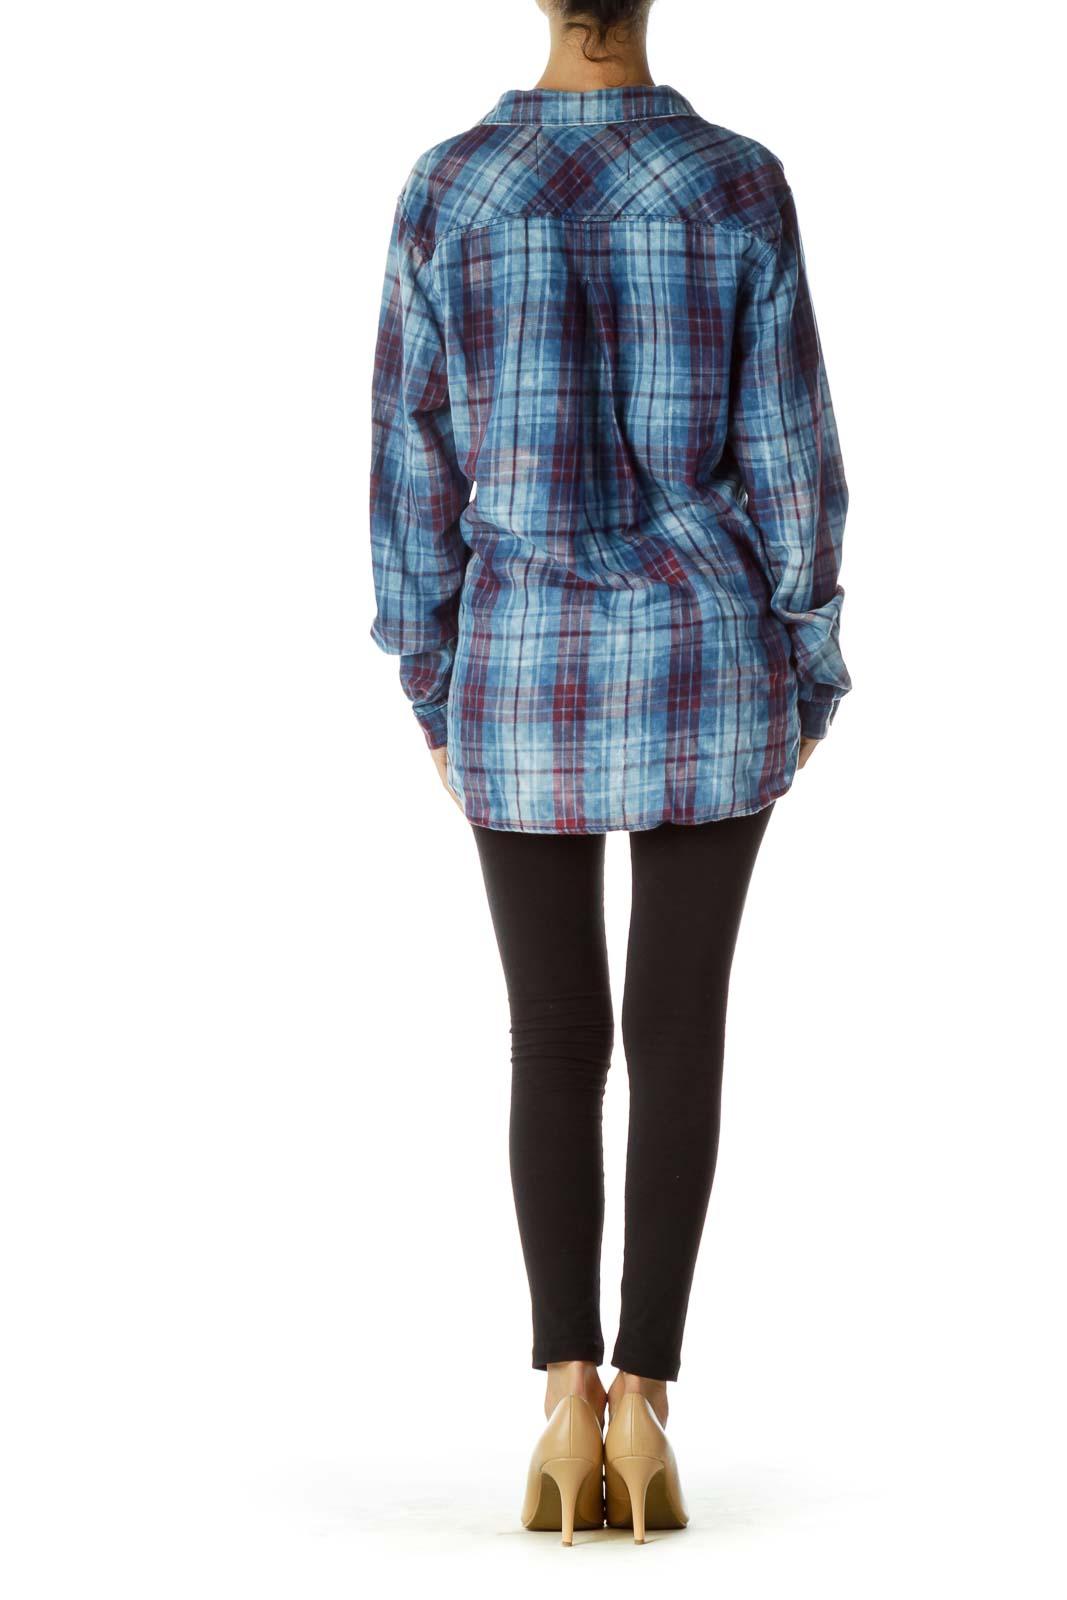 e2342aa23d05 Shop Blue Red Plaid Shirt clothing and handbags at SilkRoll. Trade ...